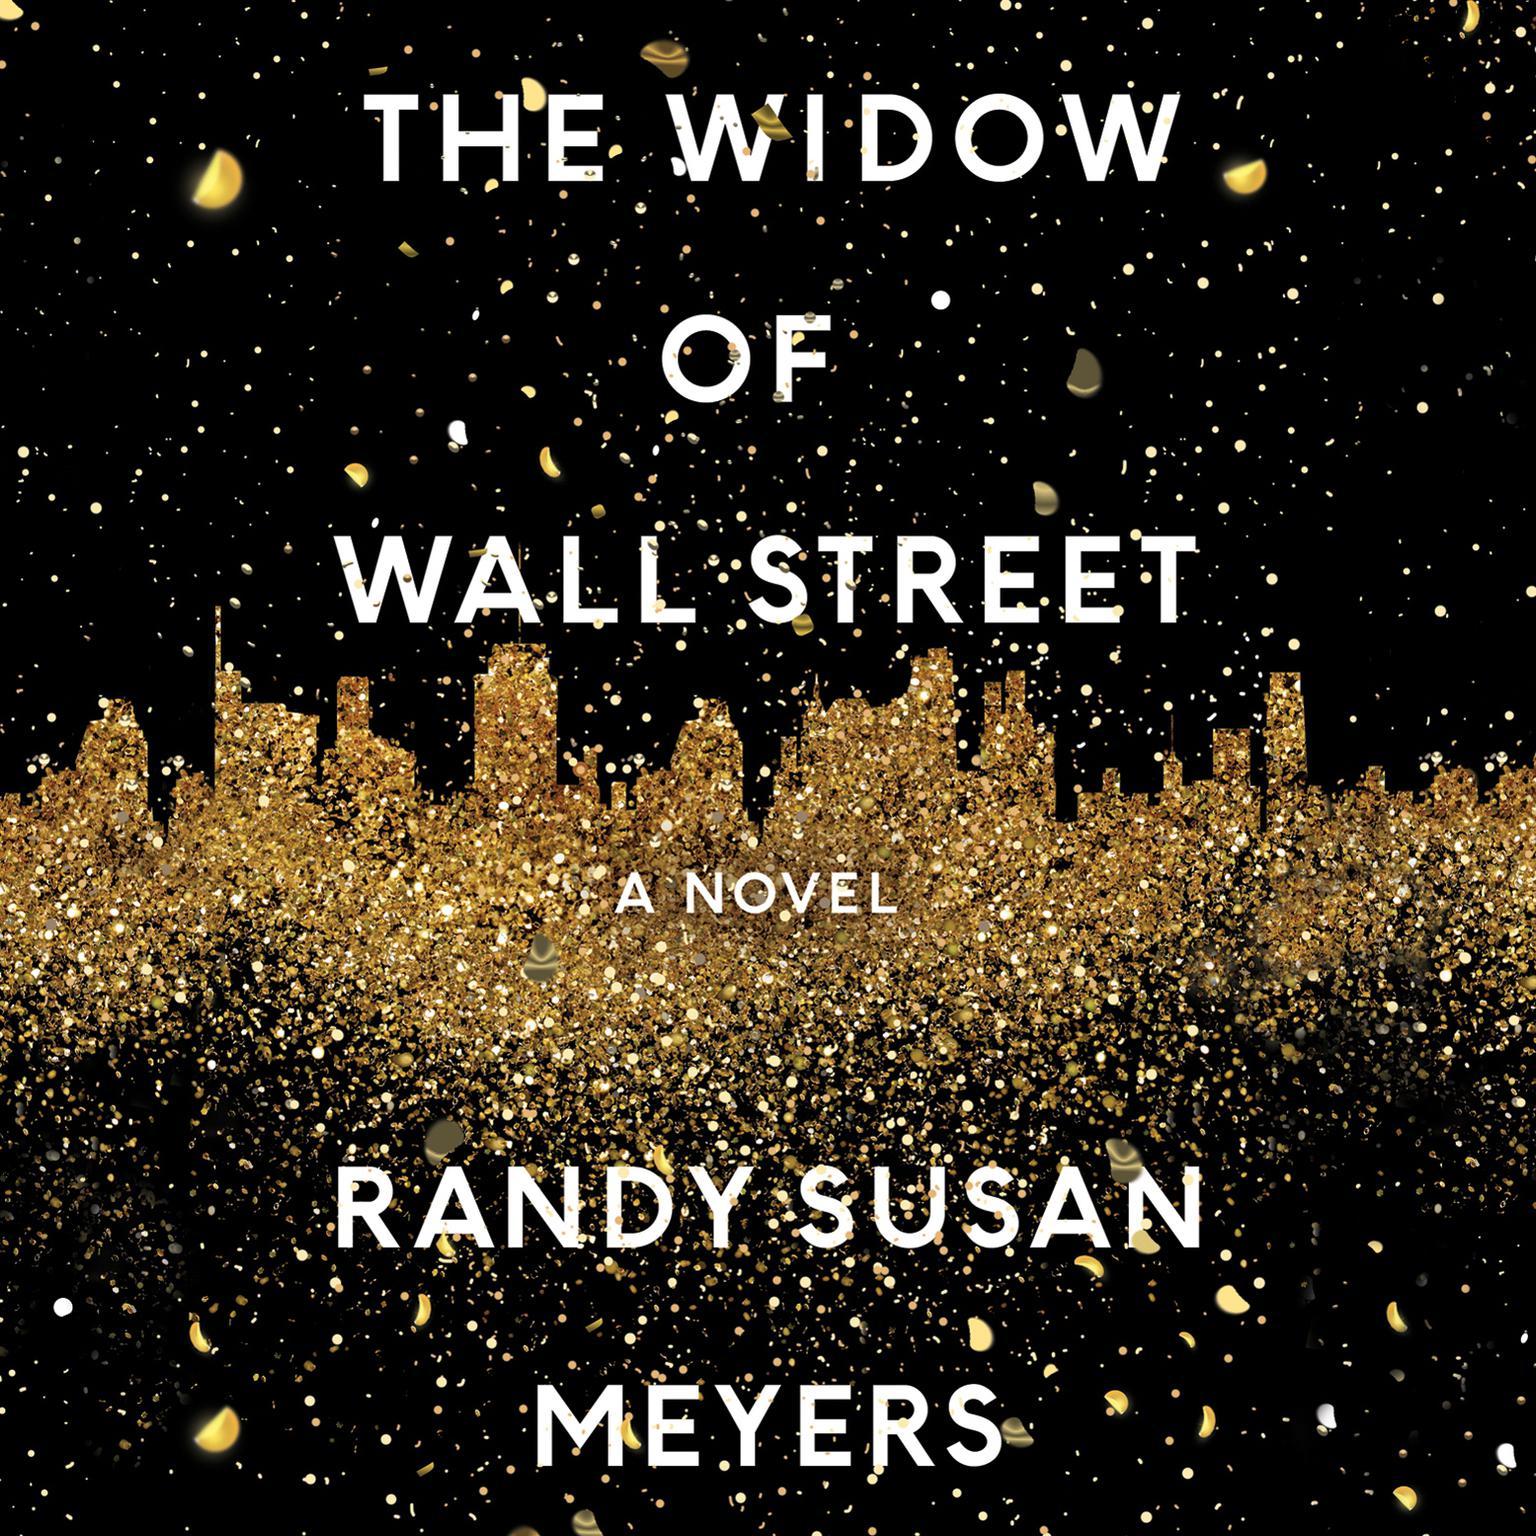 The Widow of Wall Street: A Novel Audiobook, by Randy Susan Meyers